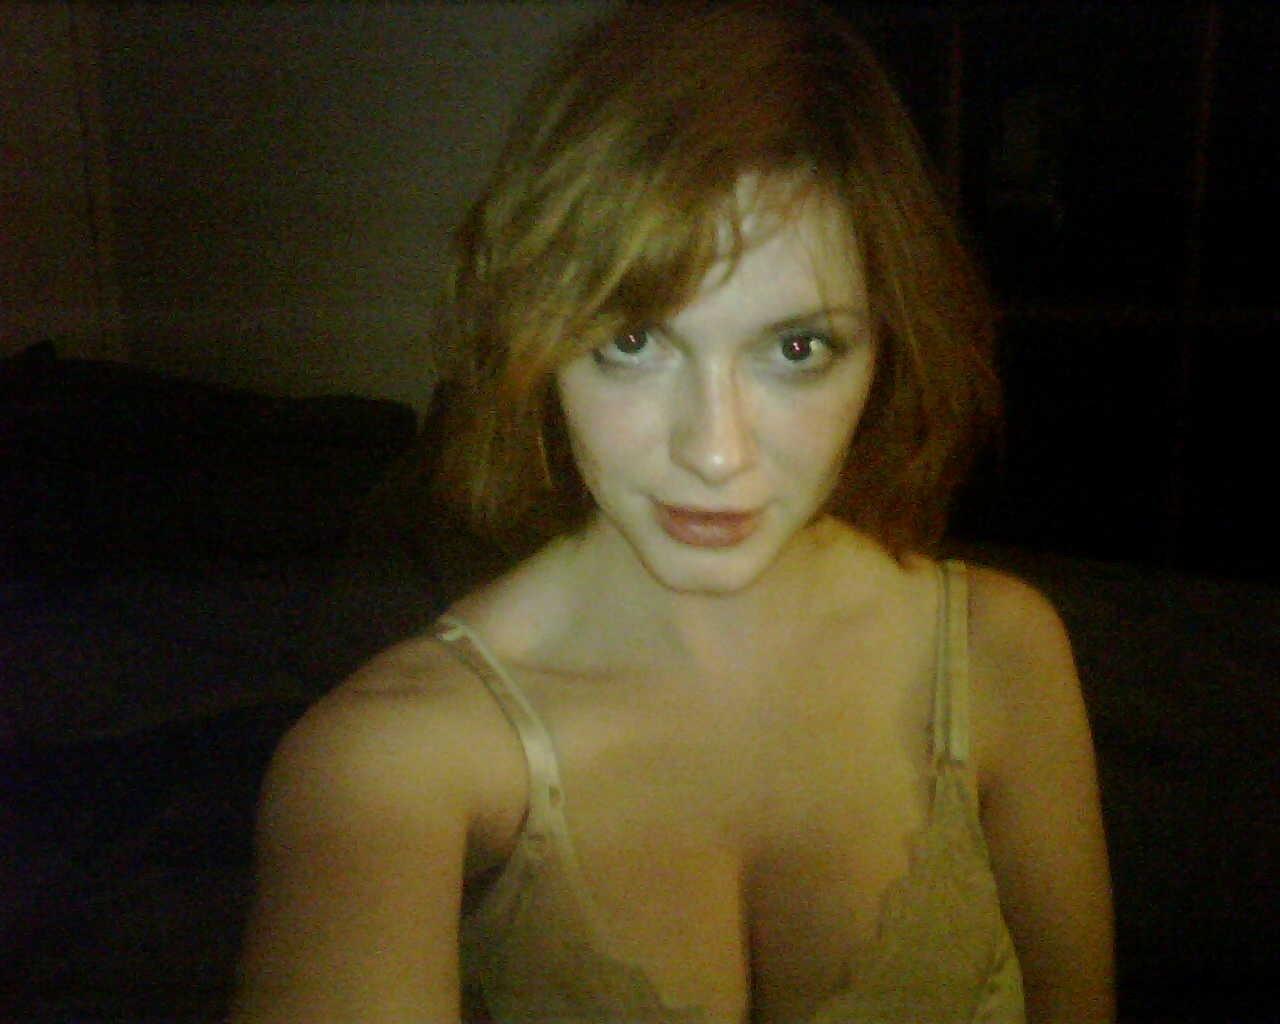 Christina Hendricks Boobs Compilation - XVIDEOSCOM